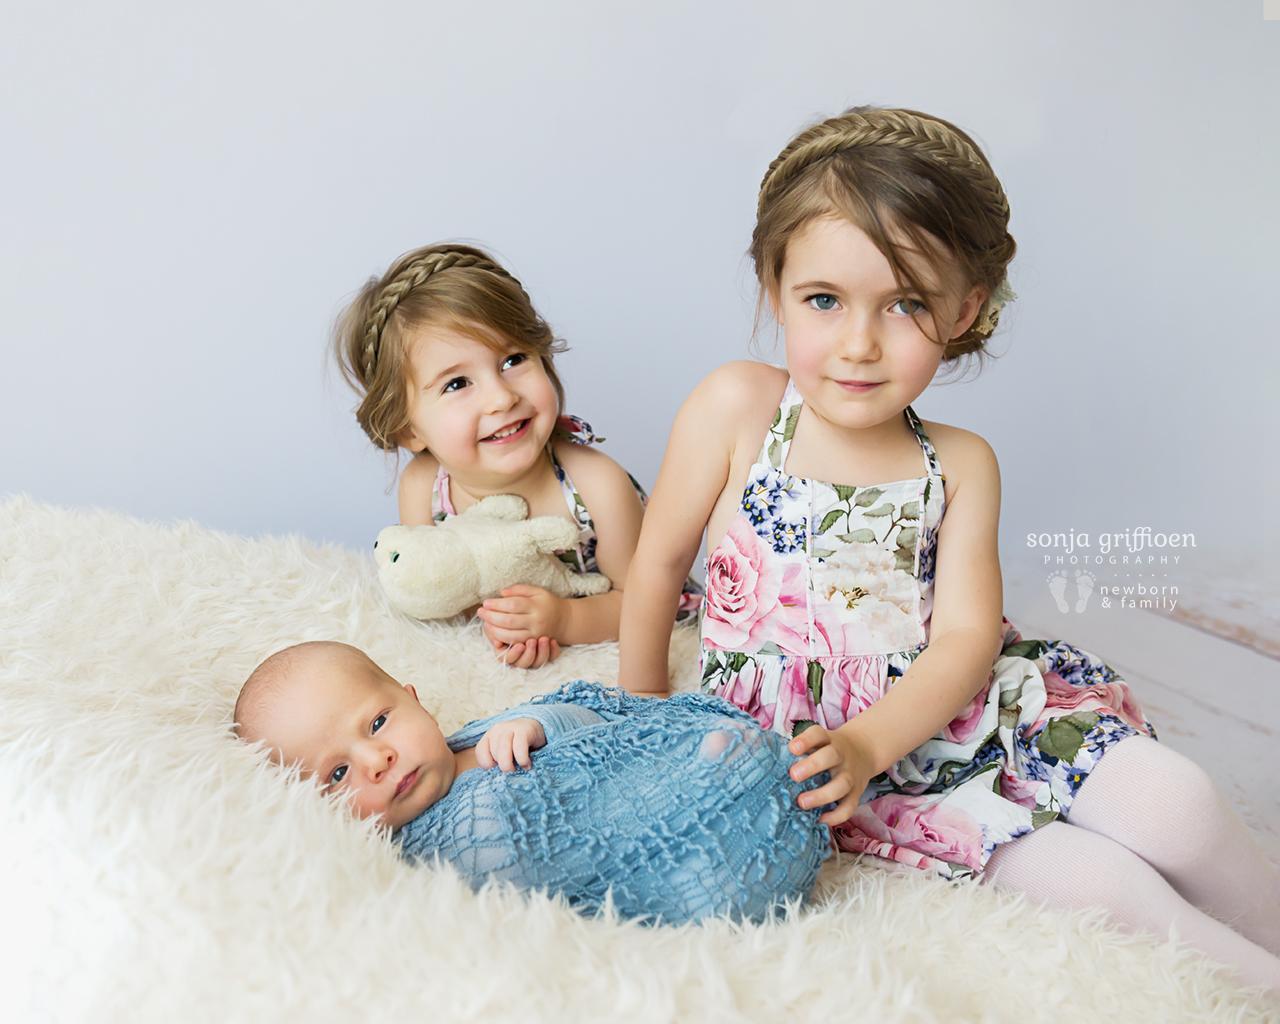 Fletcher-Newborn-Brisbane-Newborn-Photographer-Sonja-Griffioen-04.jpg